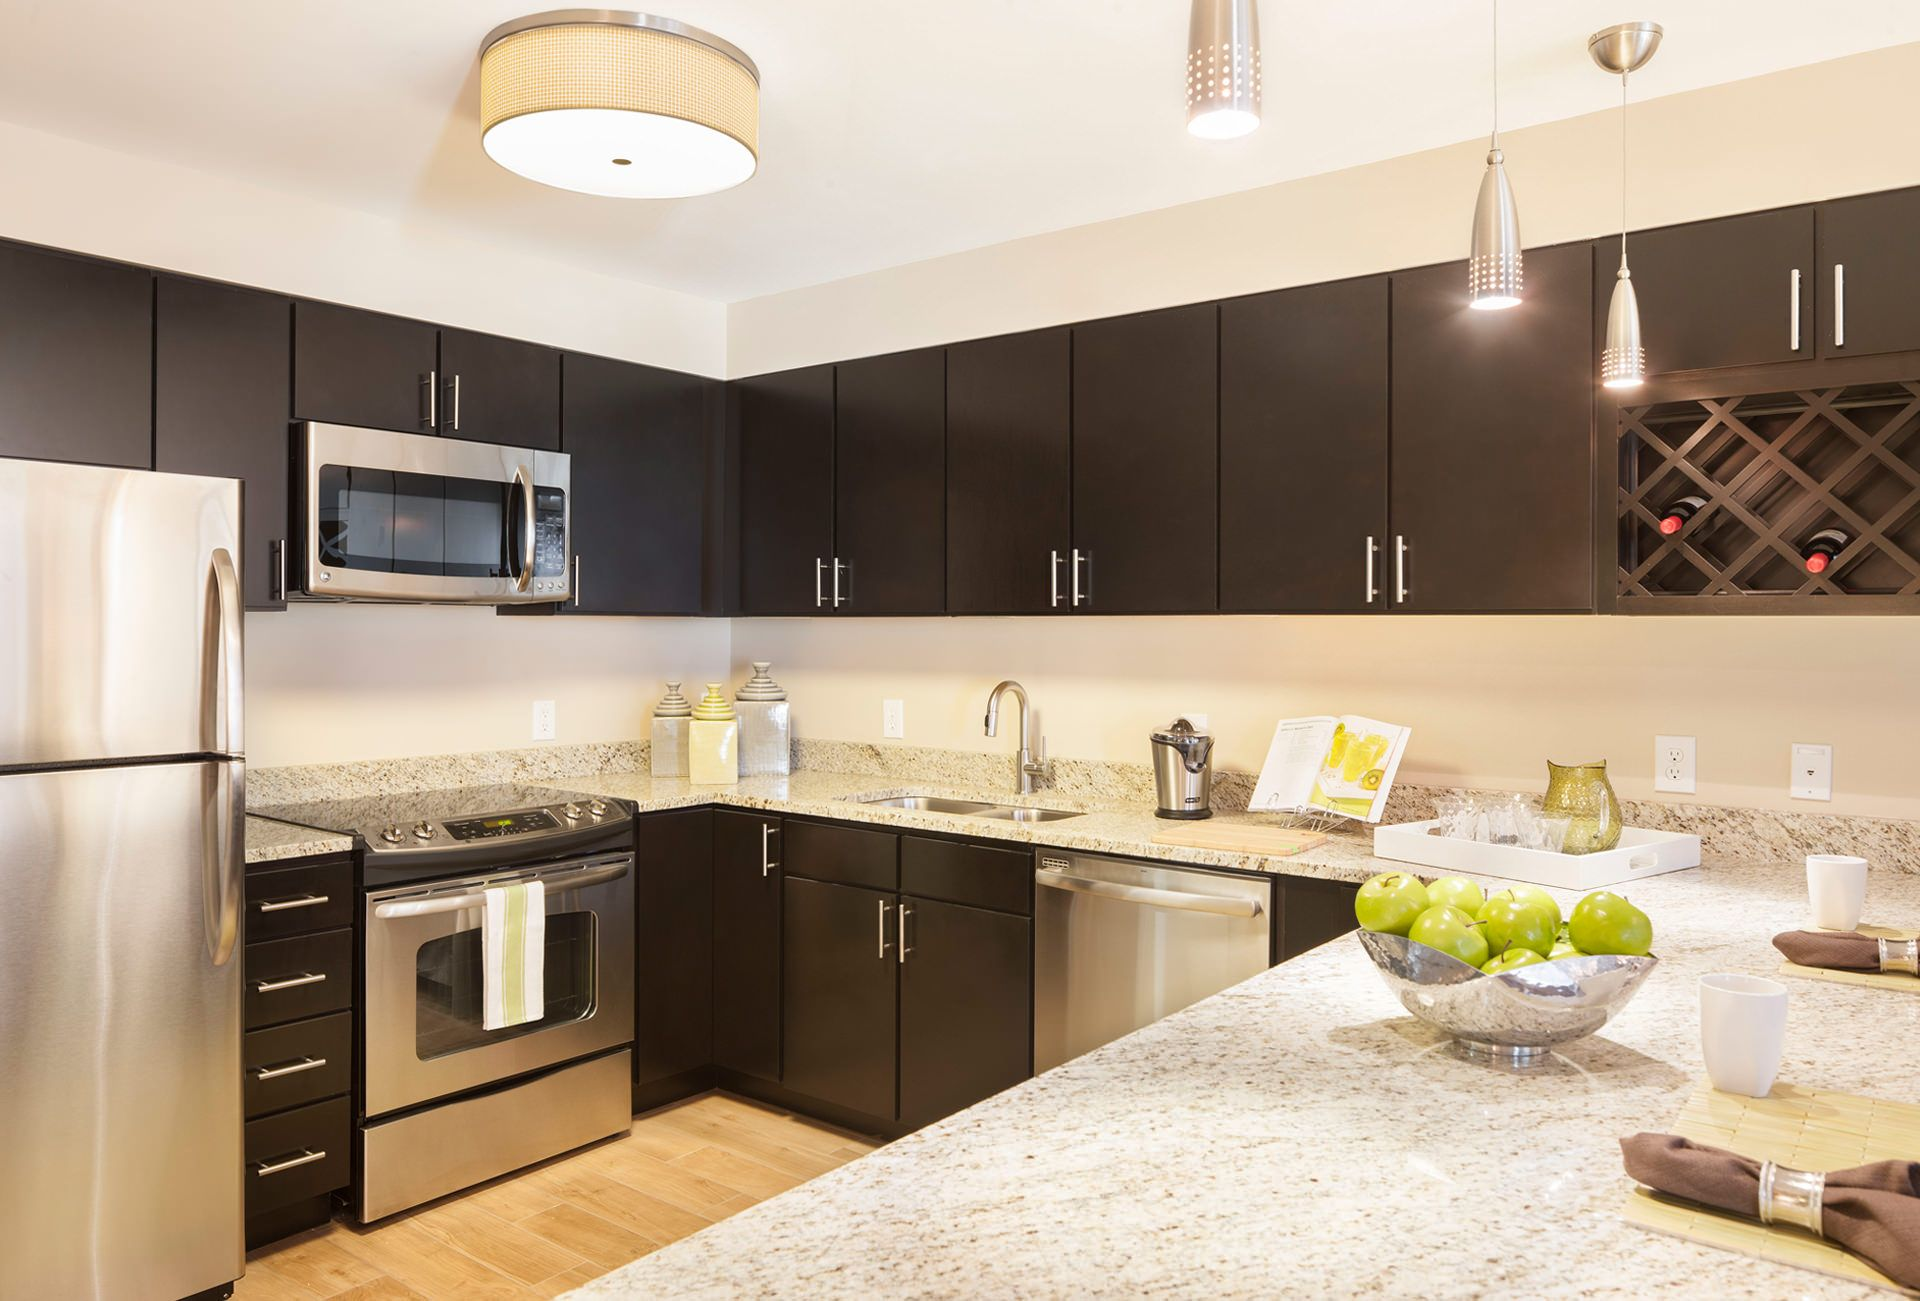 Espresso Kitchen Cabinets the Backsplash Depot in 2020 ...